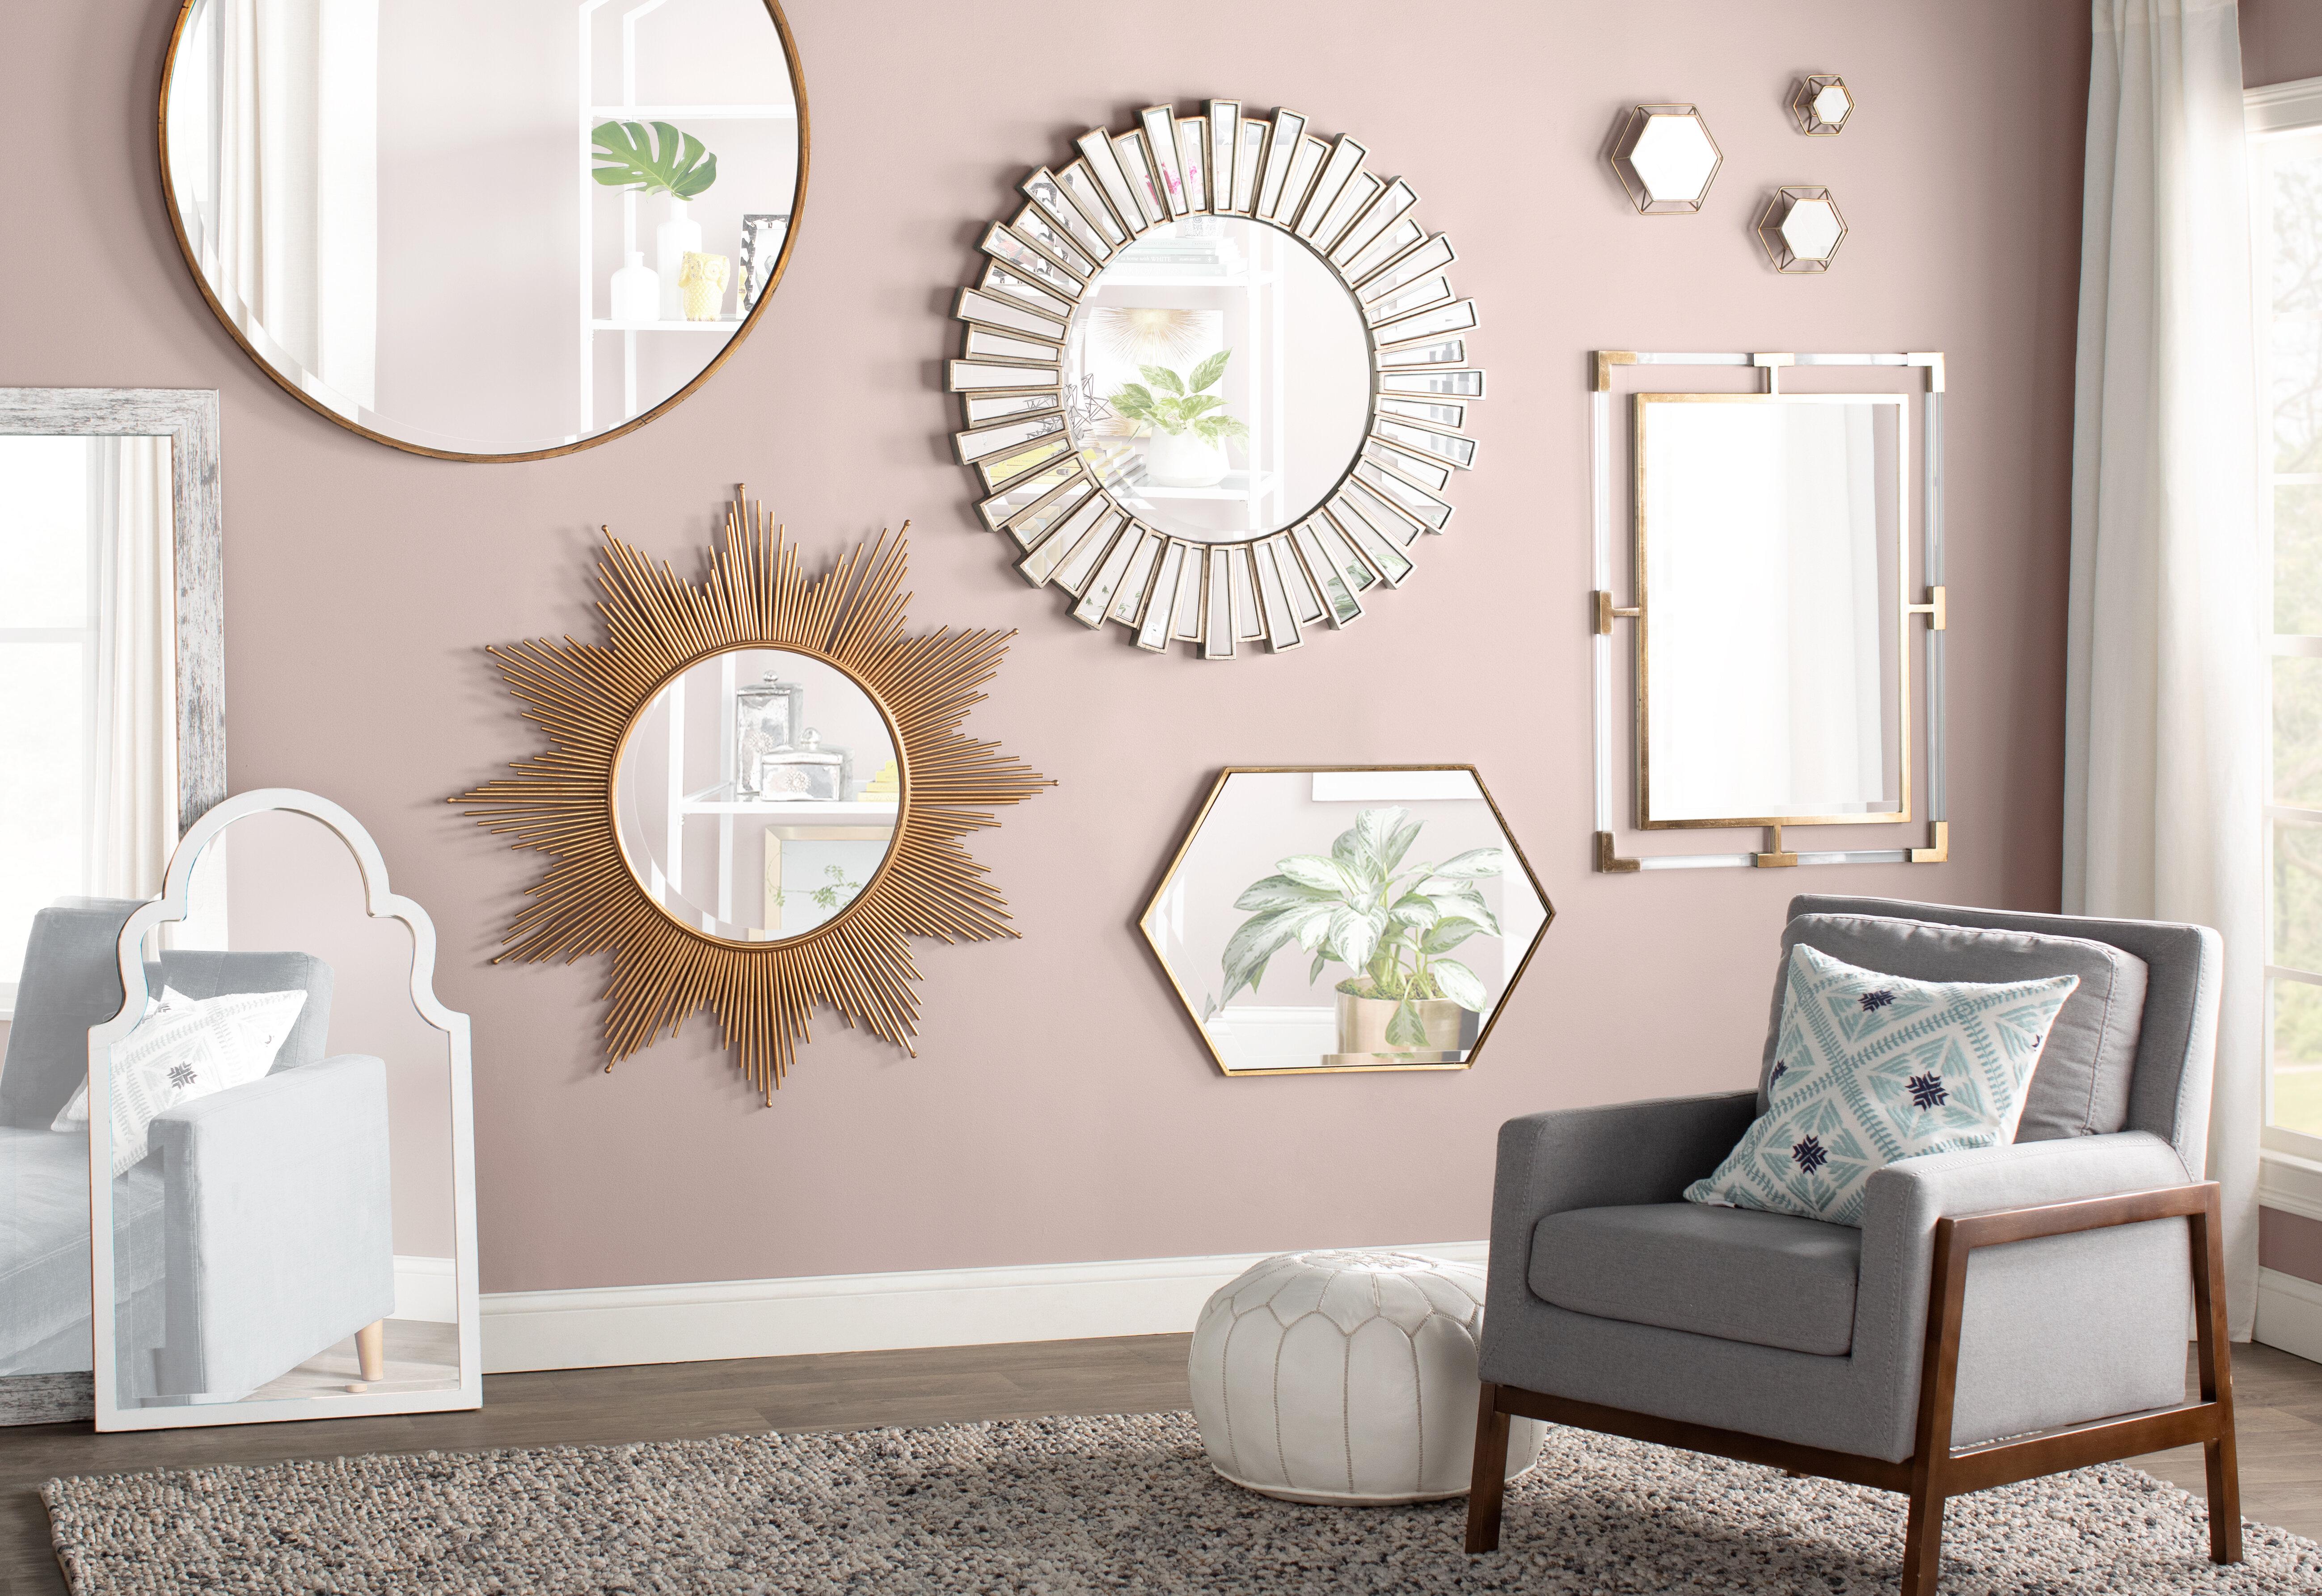 10 Dazzling Wall Mirror Decor Ideas (With Photos!) | Wayfair